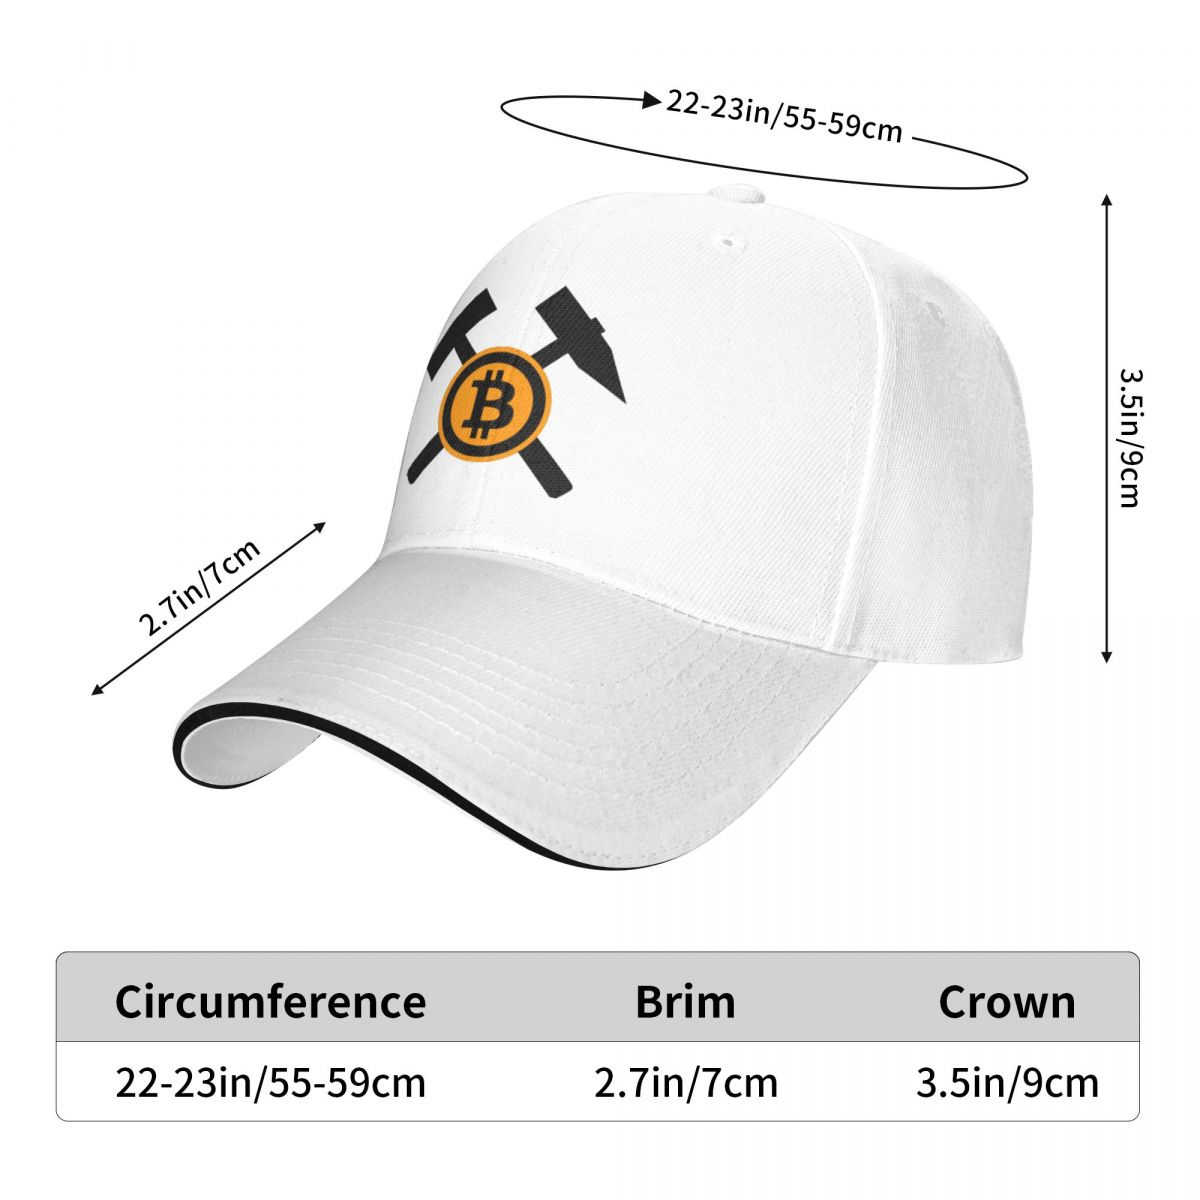 Биткоин крипто-Майнер крипто-рыболовные шляпы солнце забавная мужская женская мужская шляпа